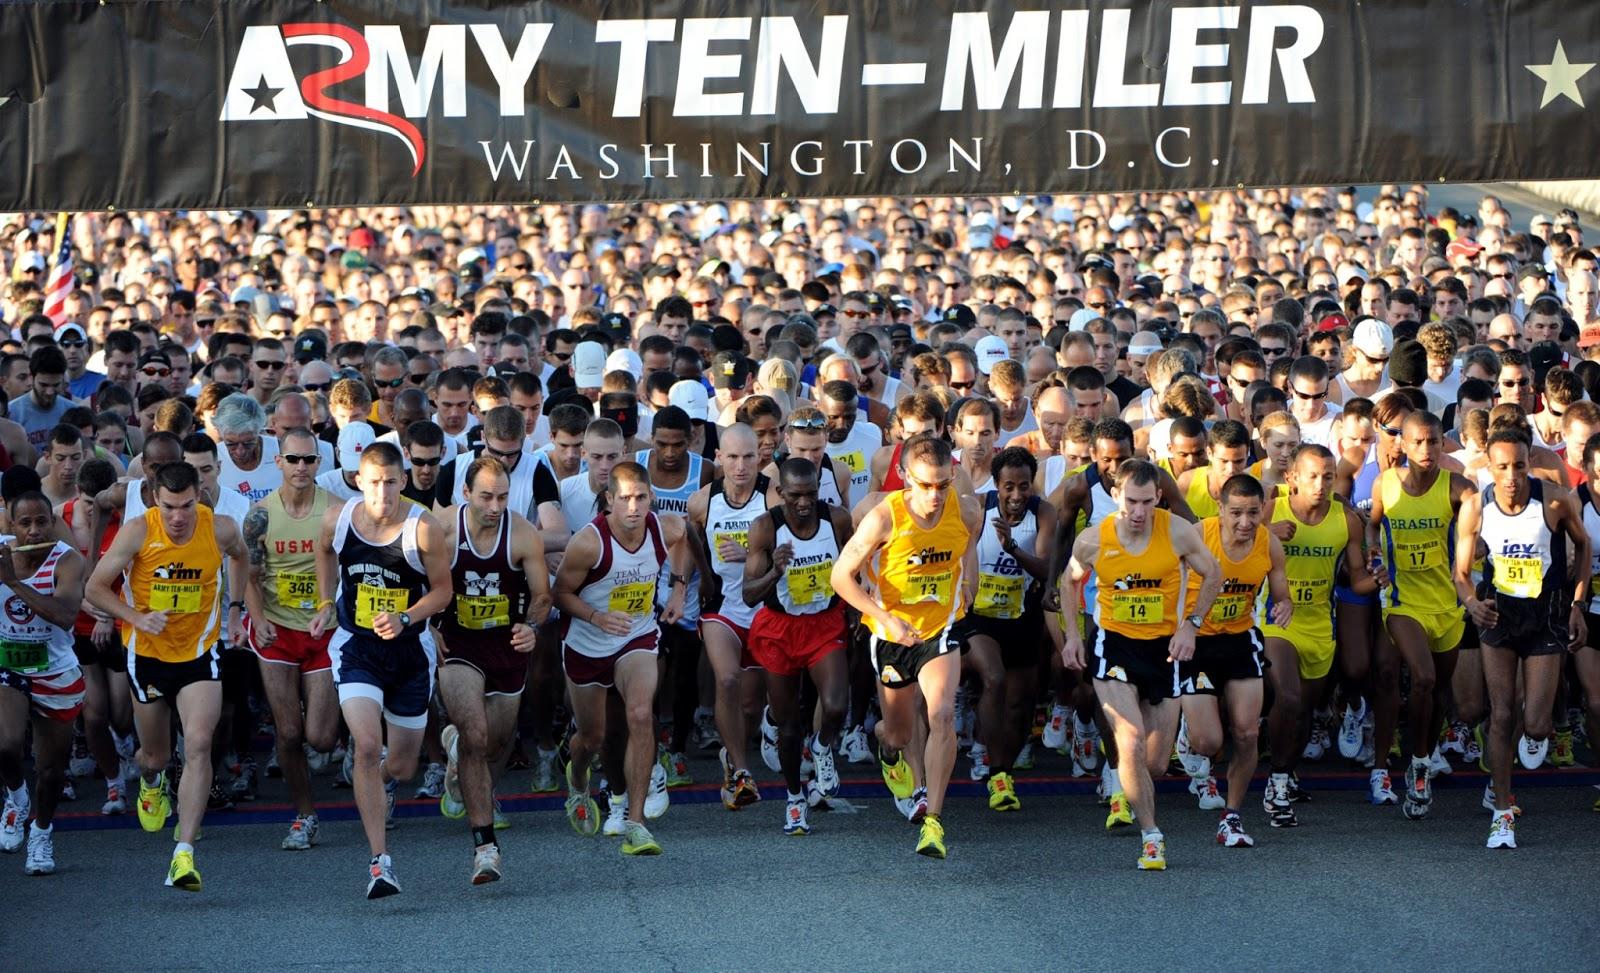 Army 10 Miler Race Recap